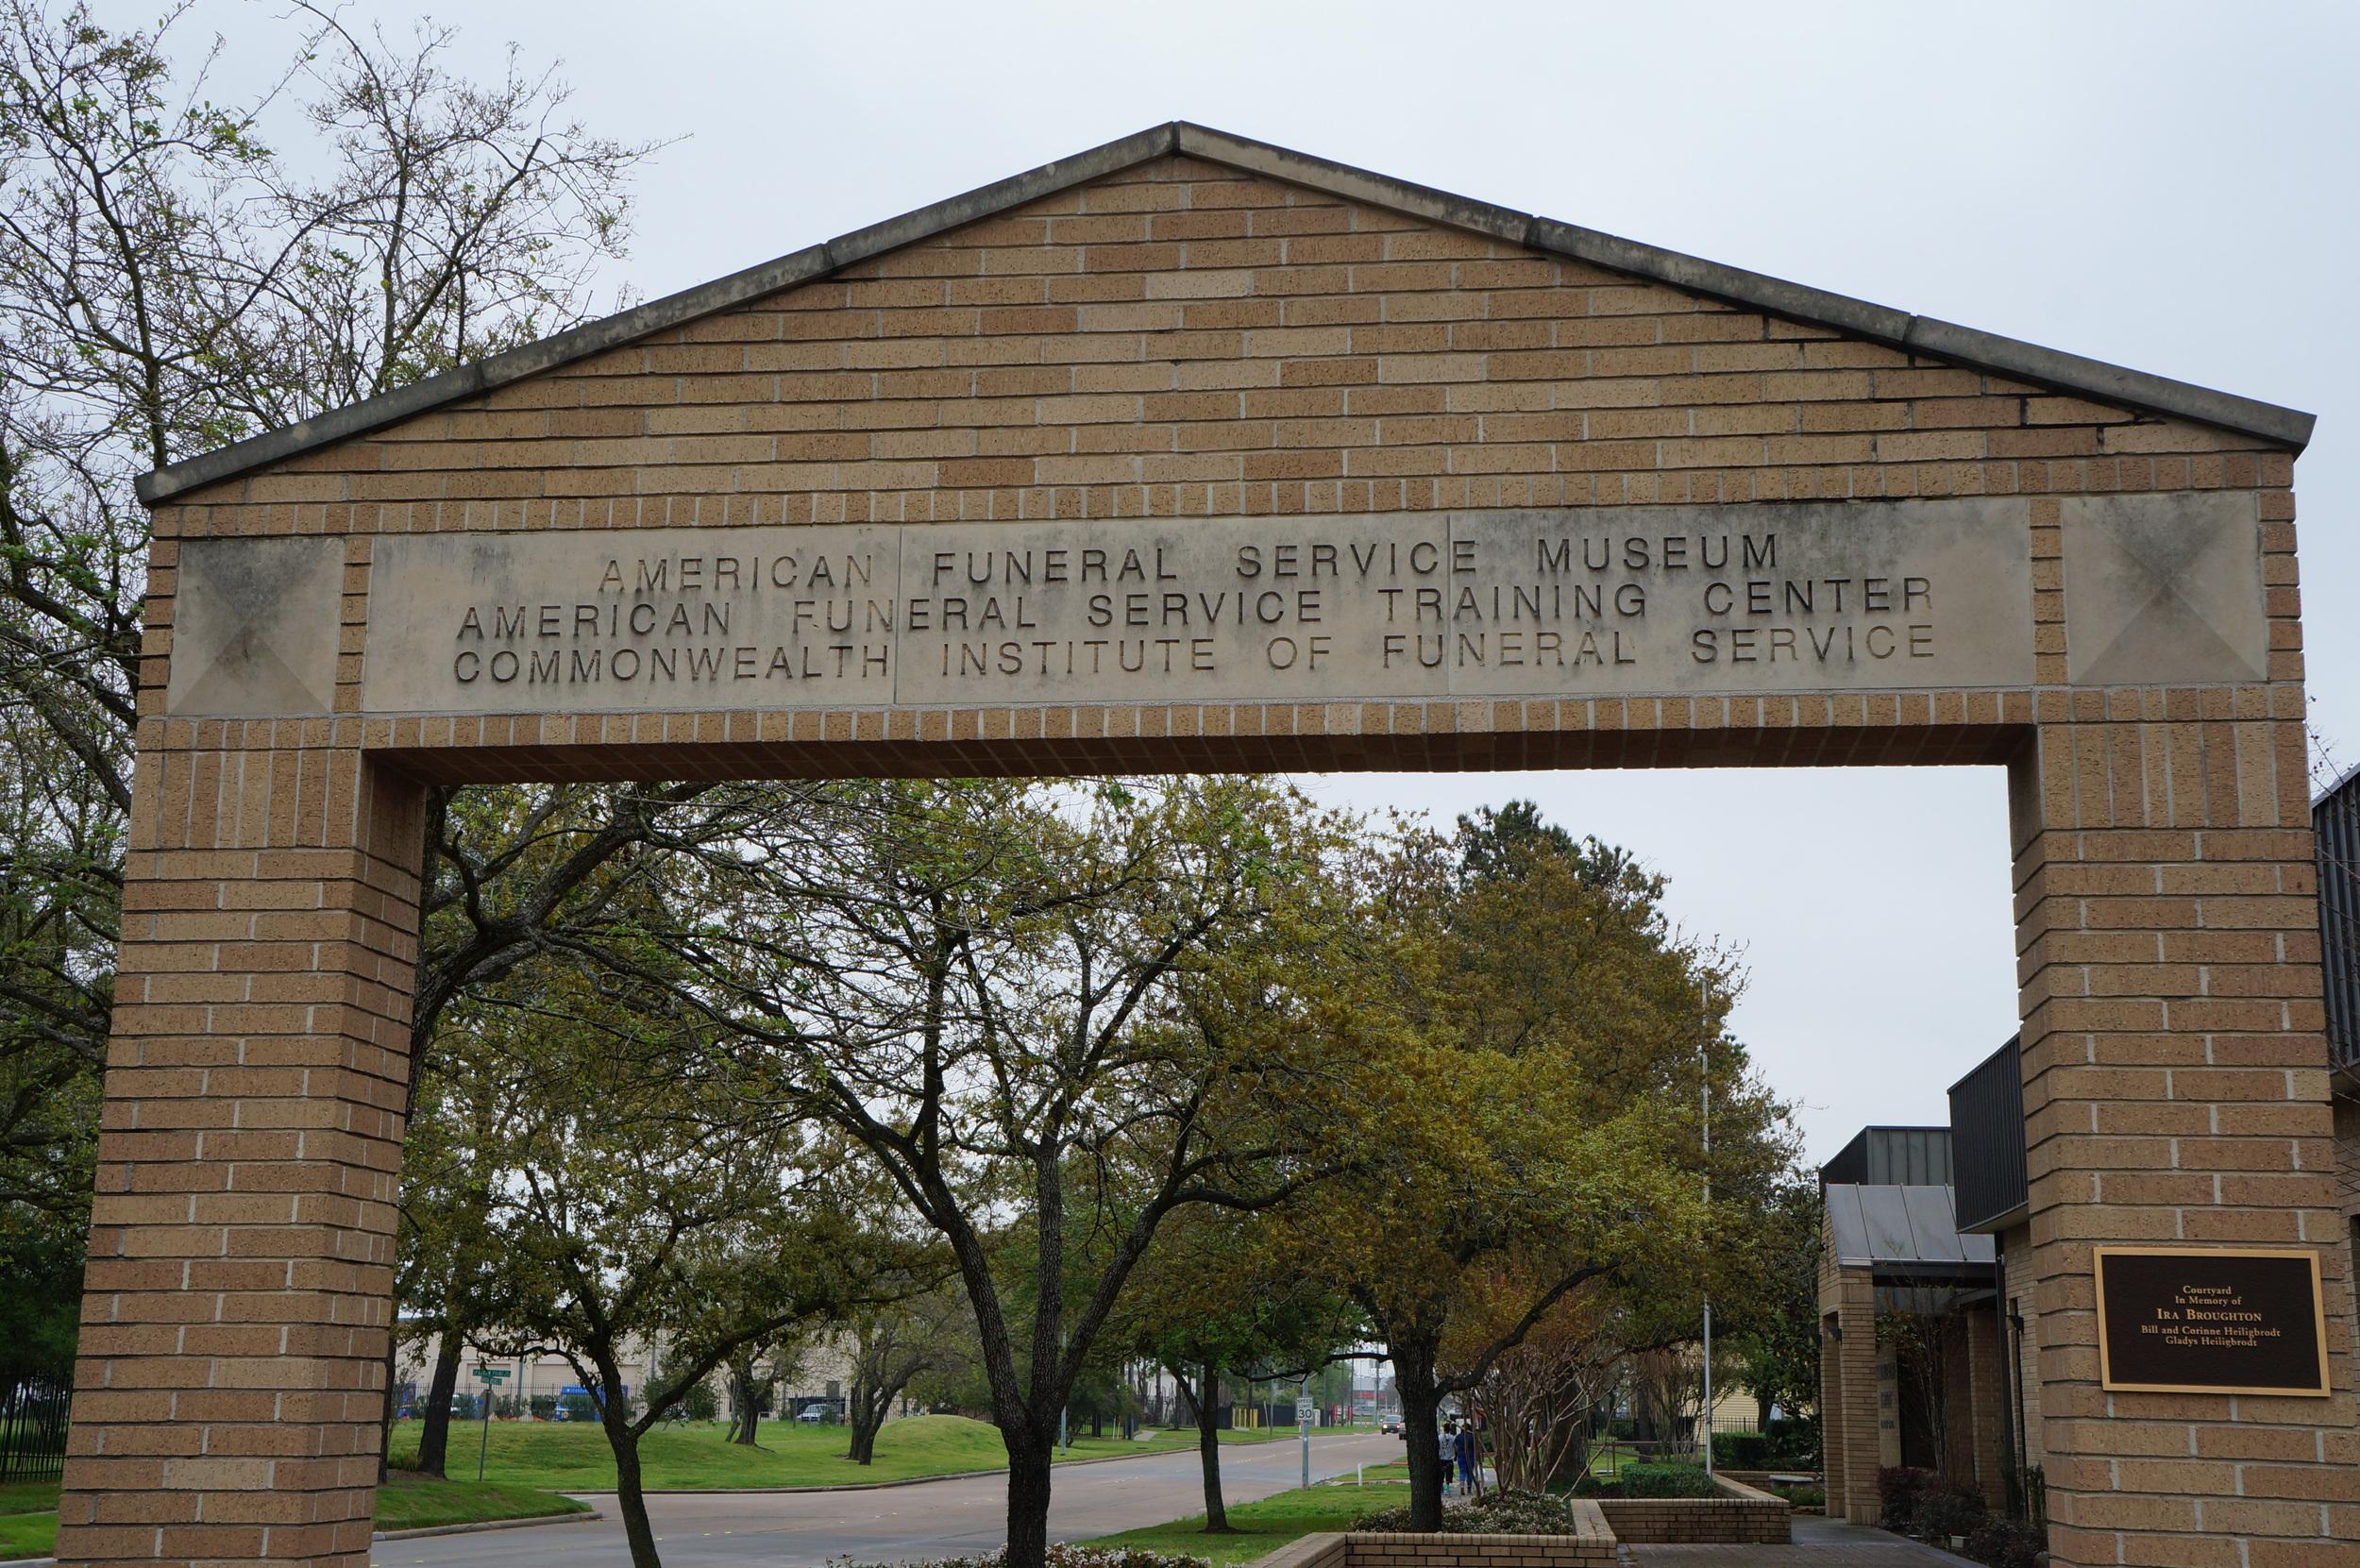 Museum entrance. (photo: L. Pyne)